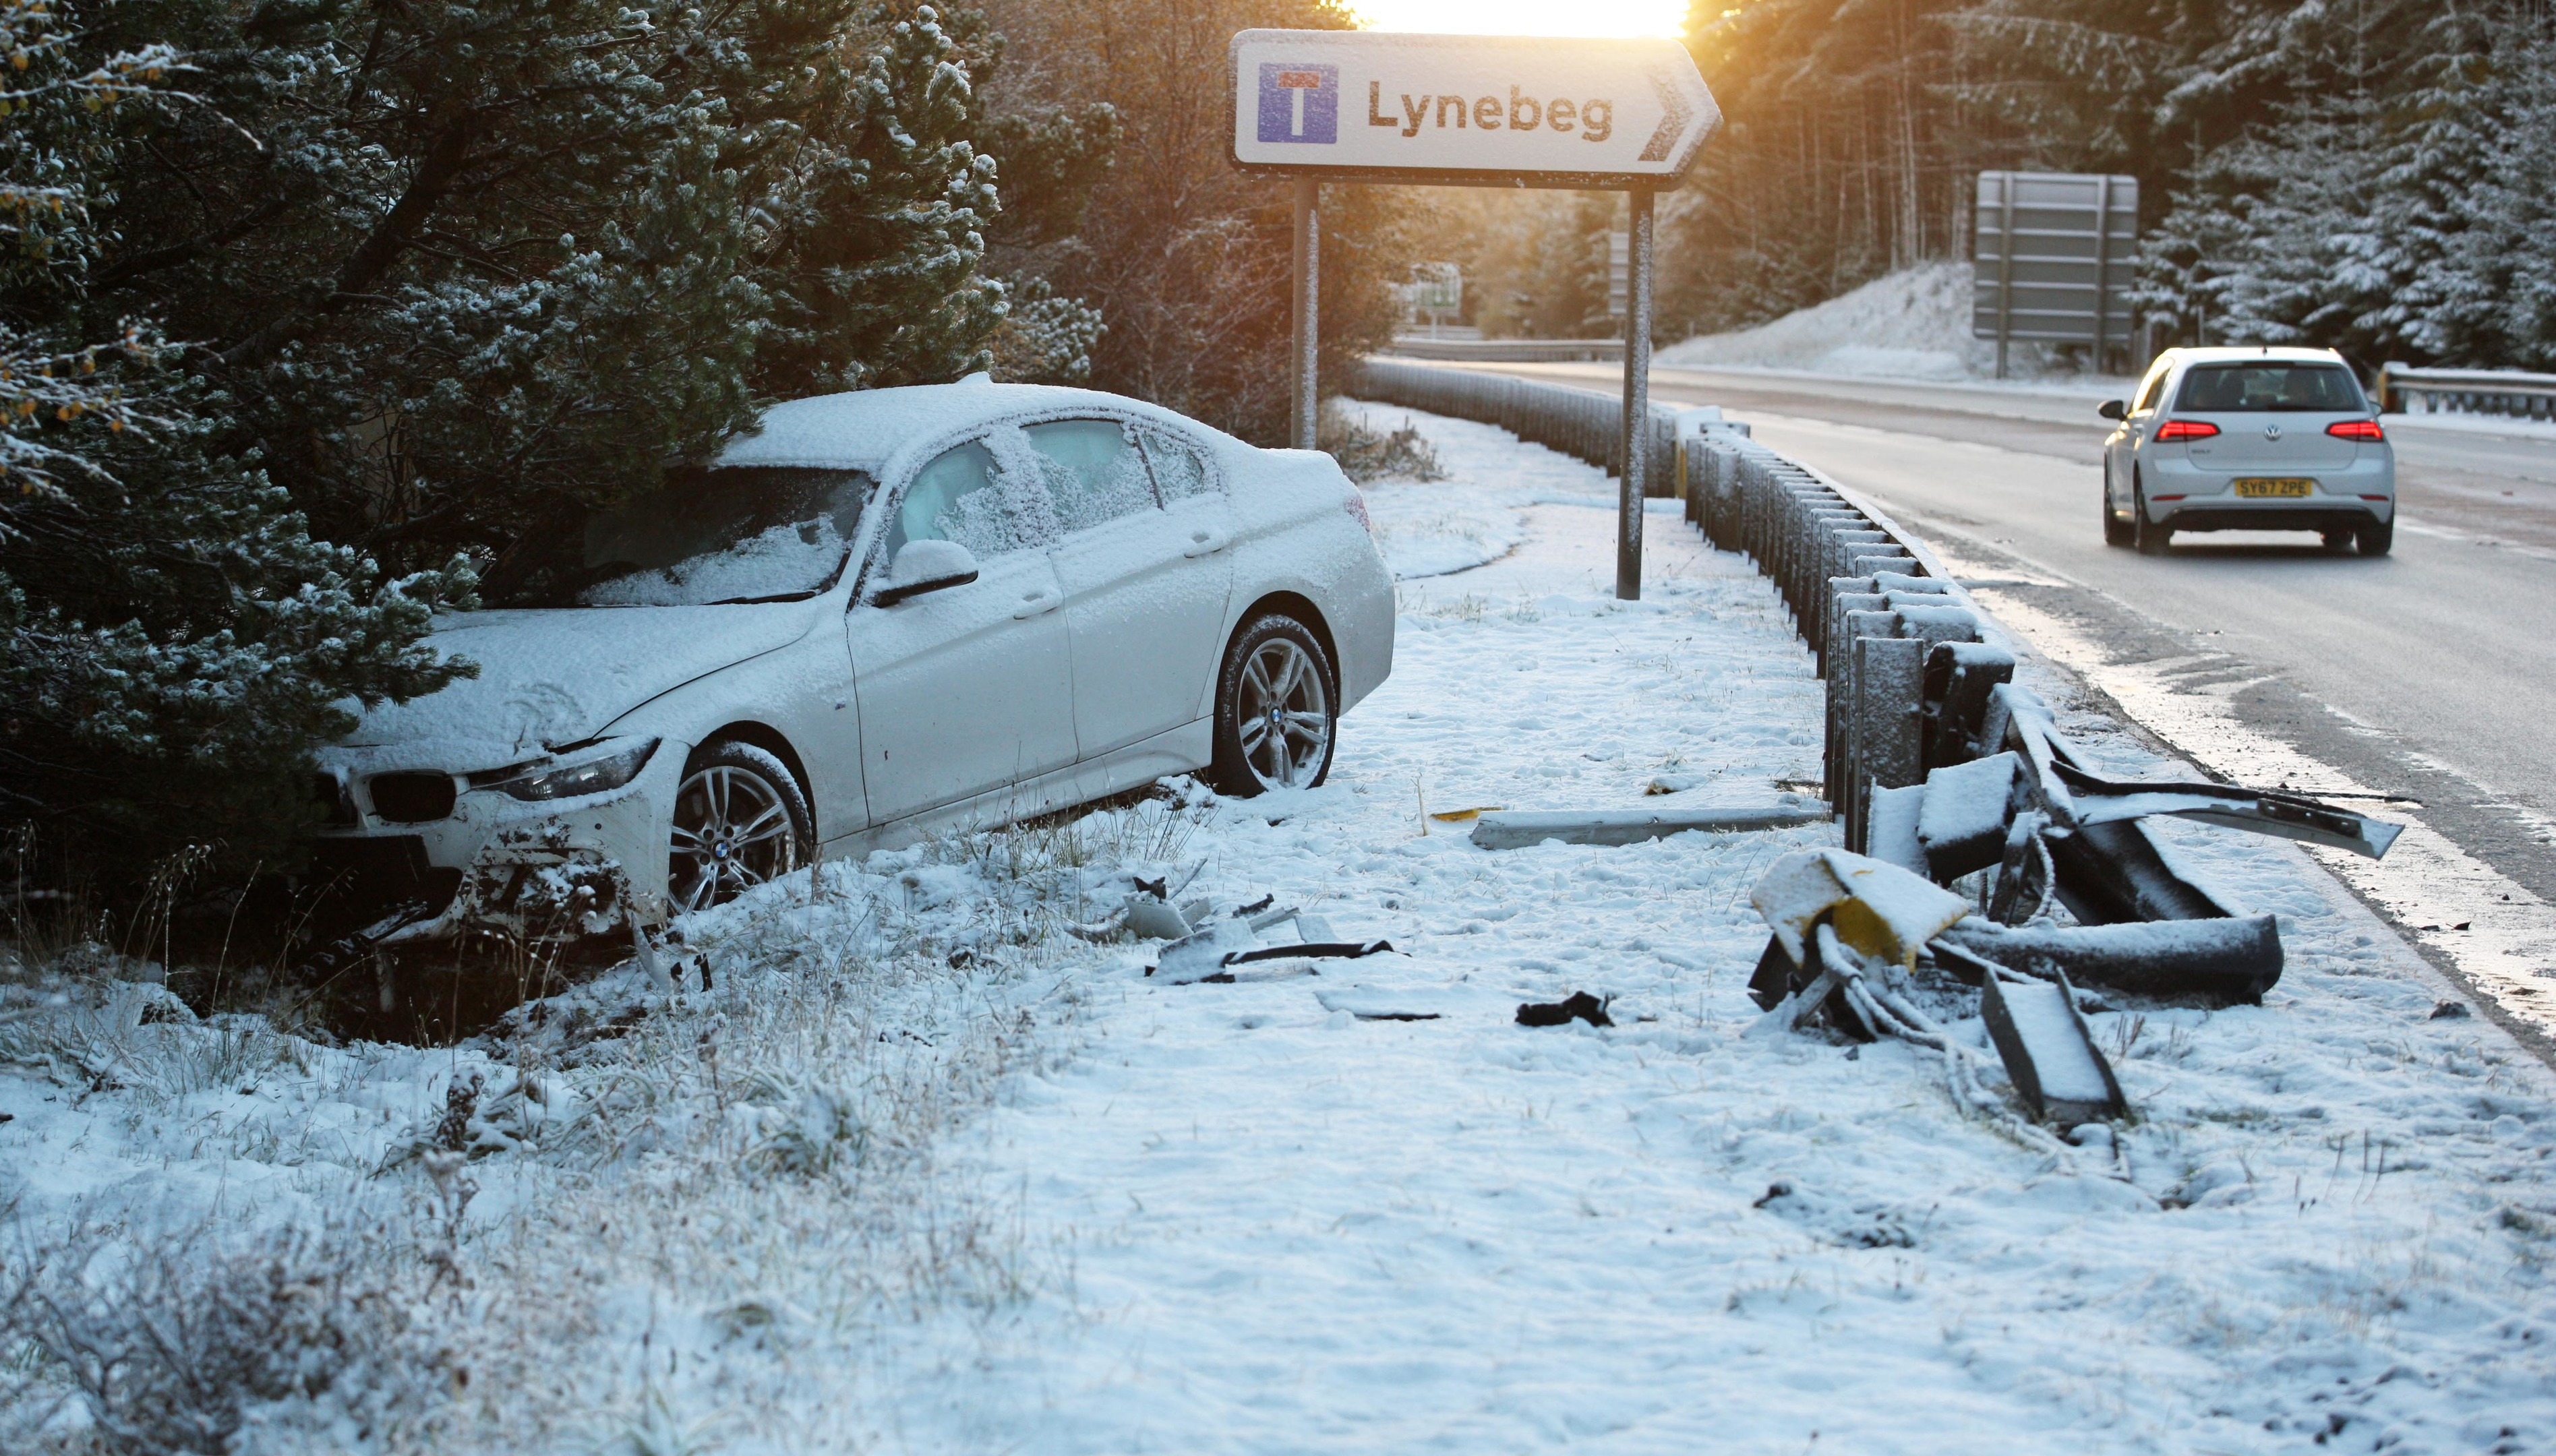 Car hits skids near Lynbeg yesterday (Peter Jolly)